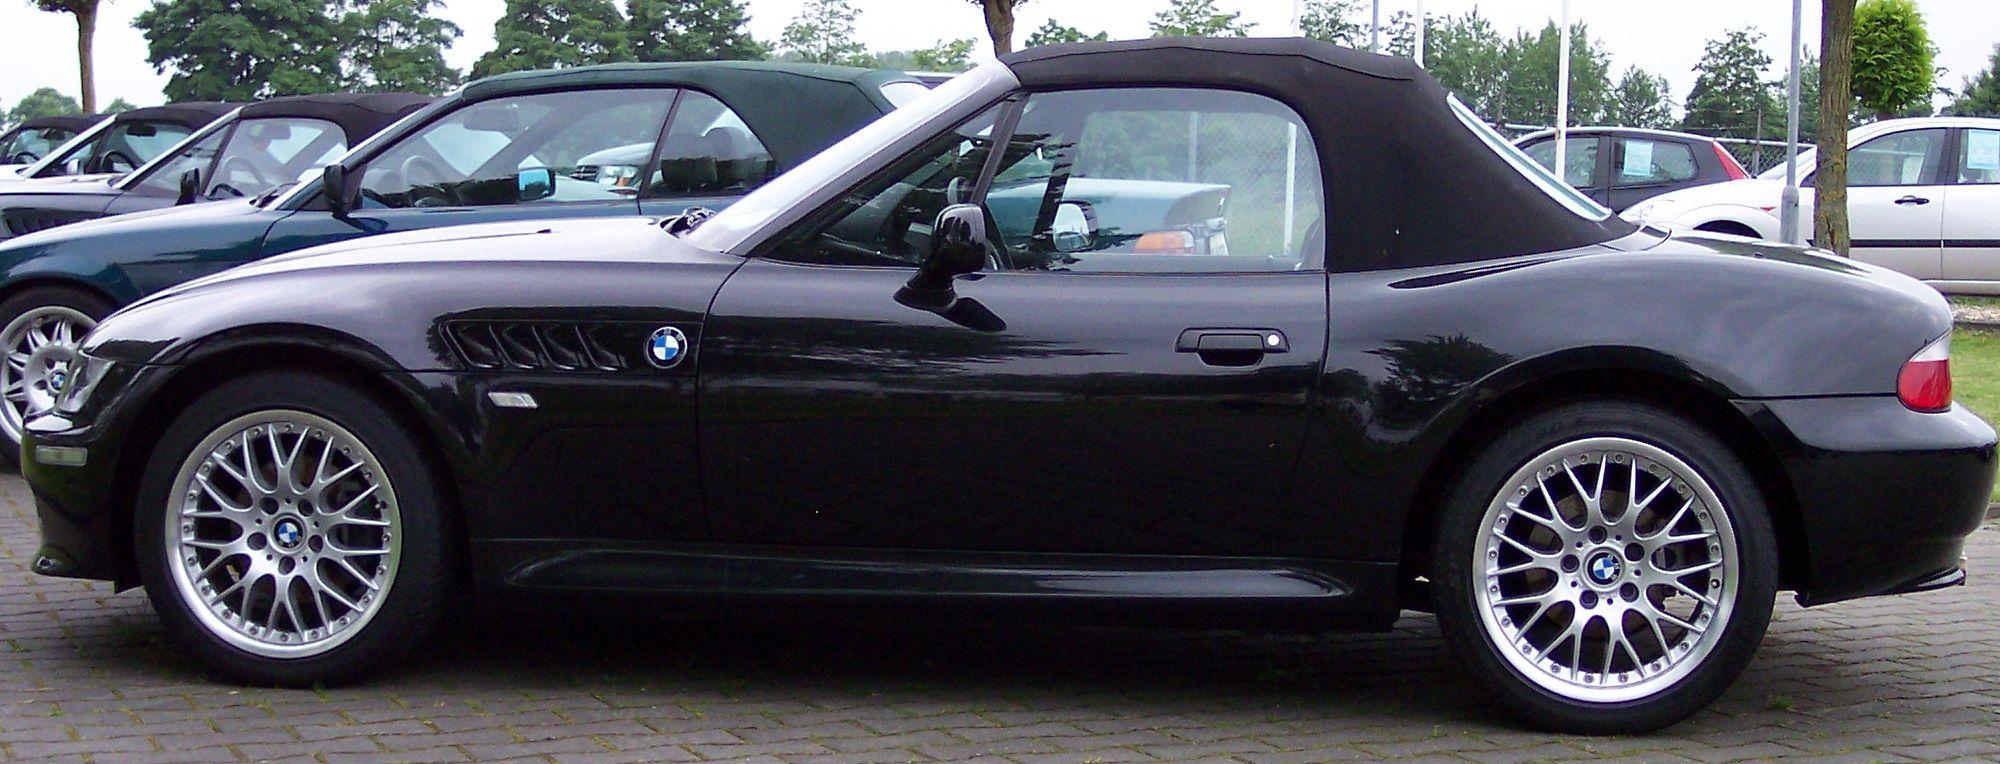 File:BMW Z3 black l.jpg - Wikimedia Commons